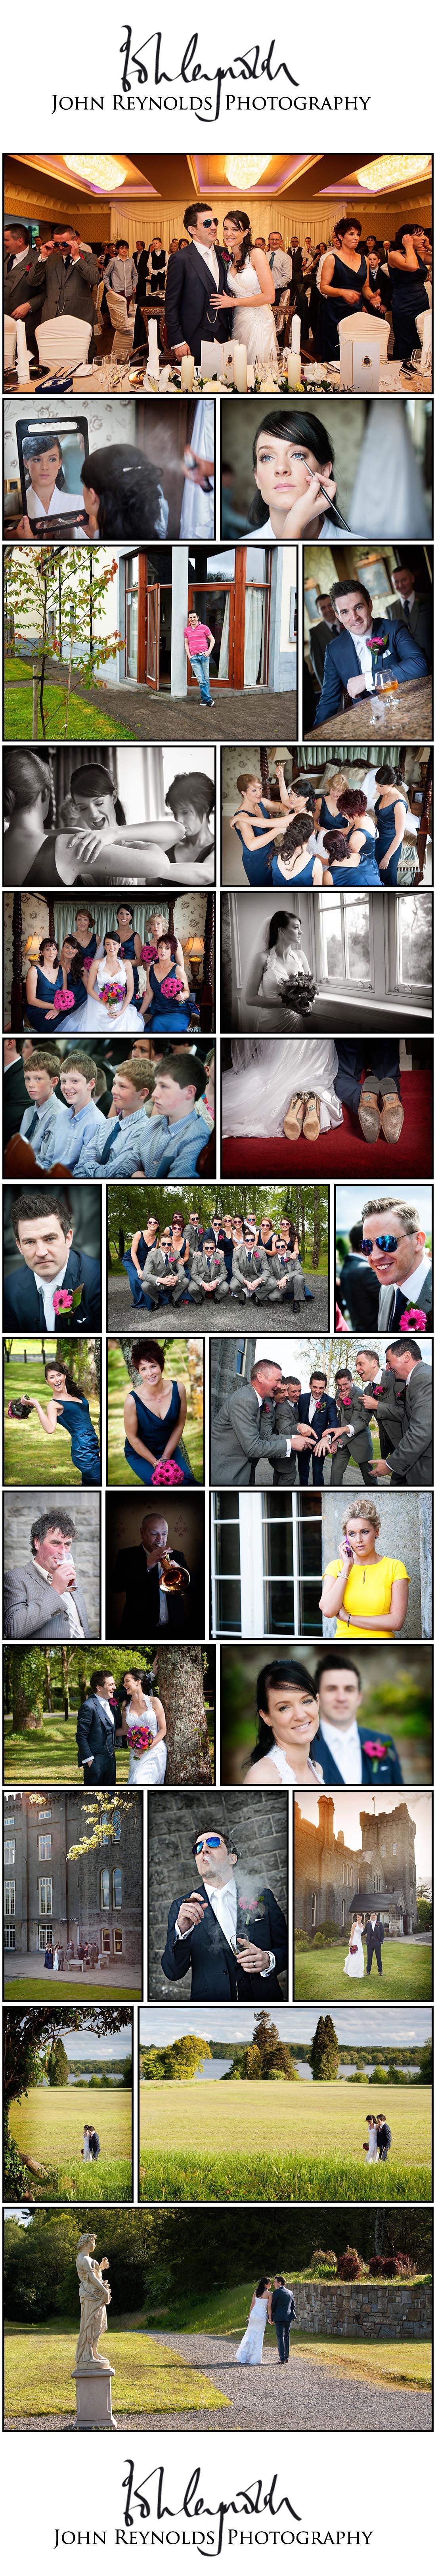 Paula & Raymond Blog Collage